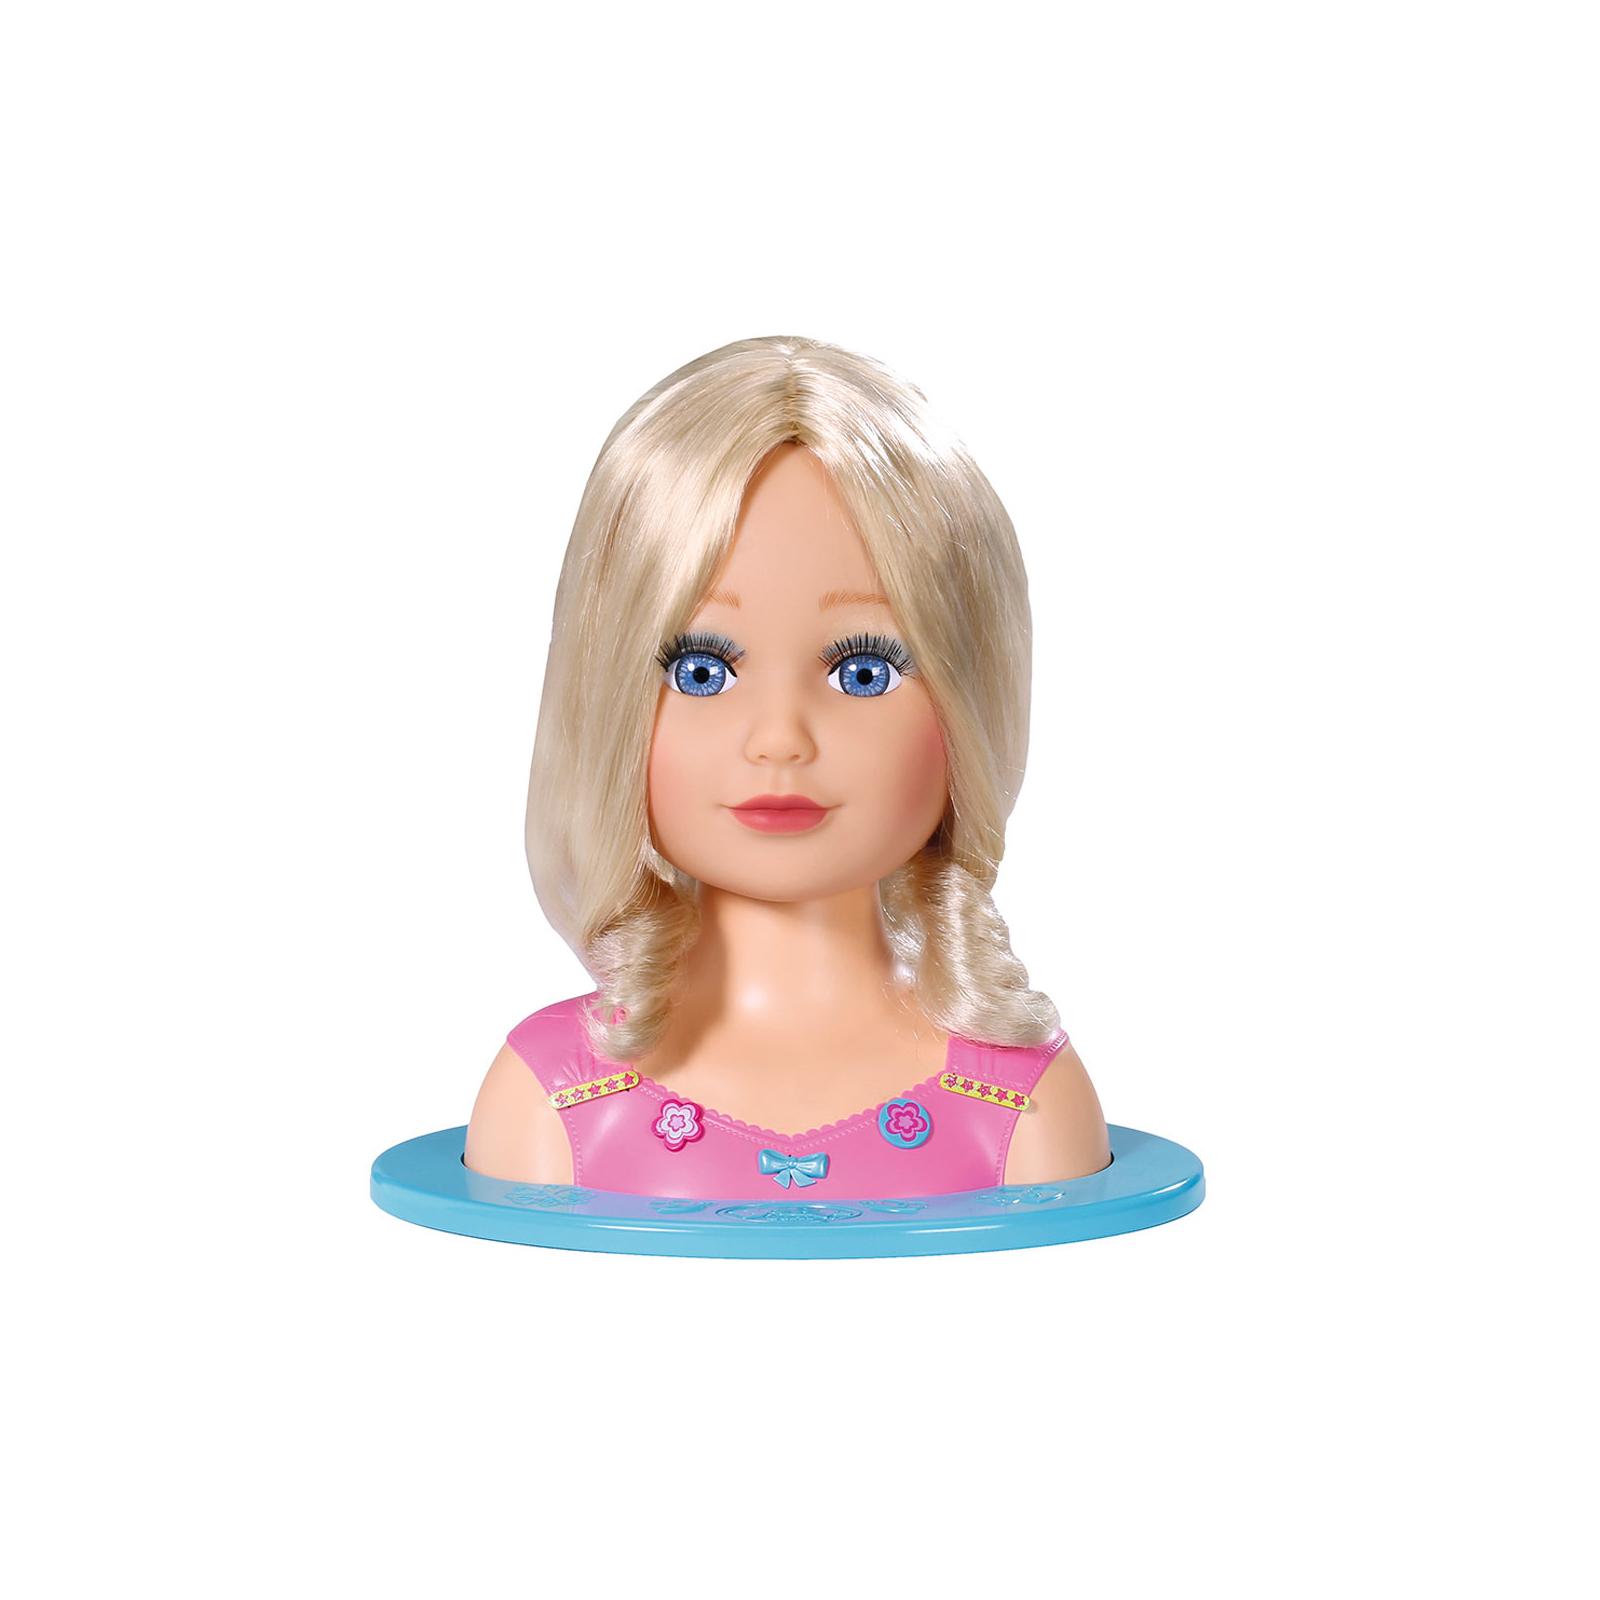 Кукла Zapf манекен My Model Сестричка с аксессуарами (824788) изображение 2